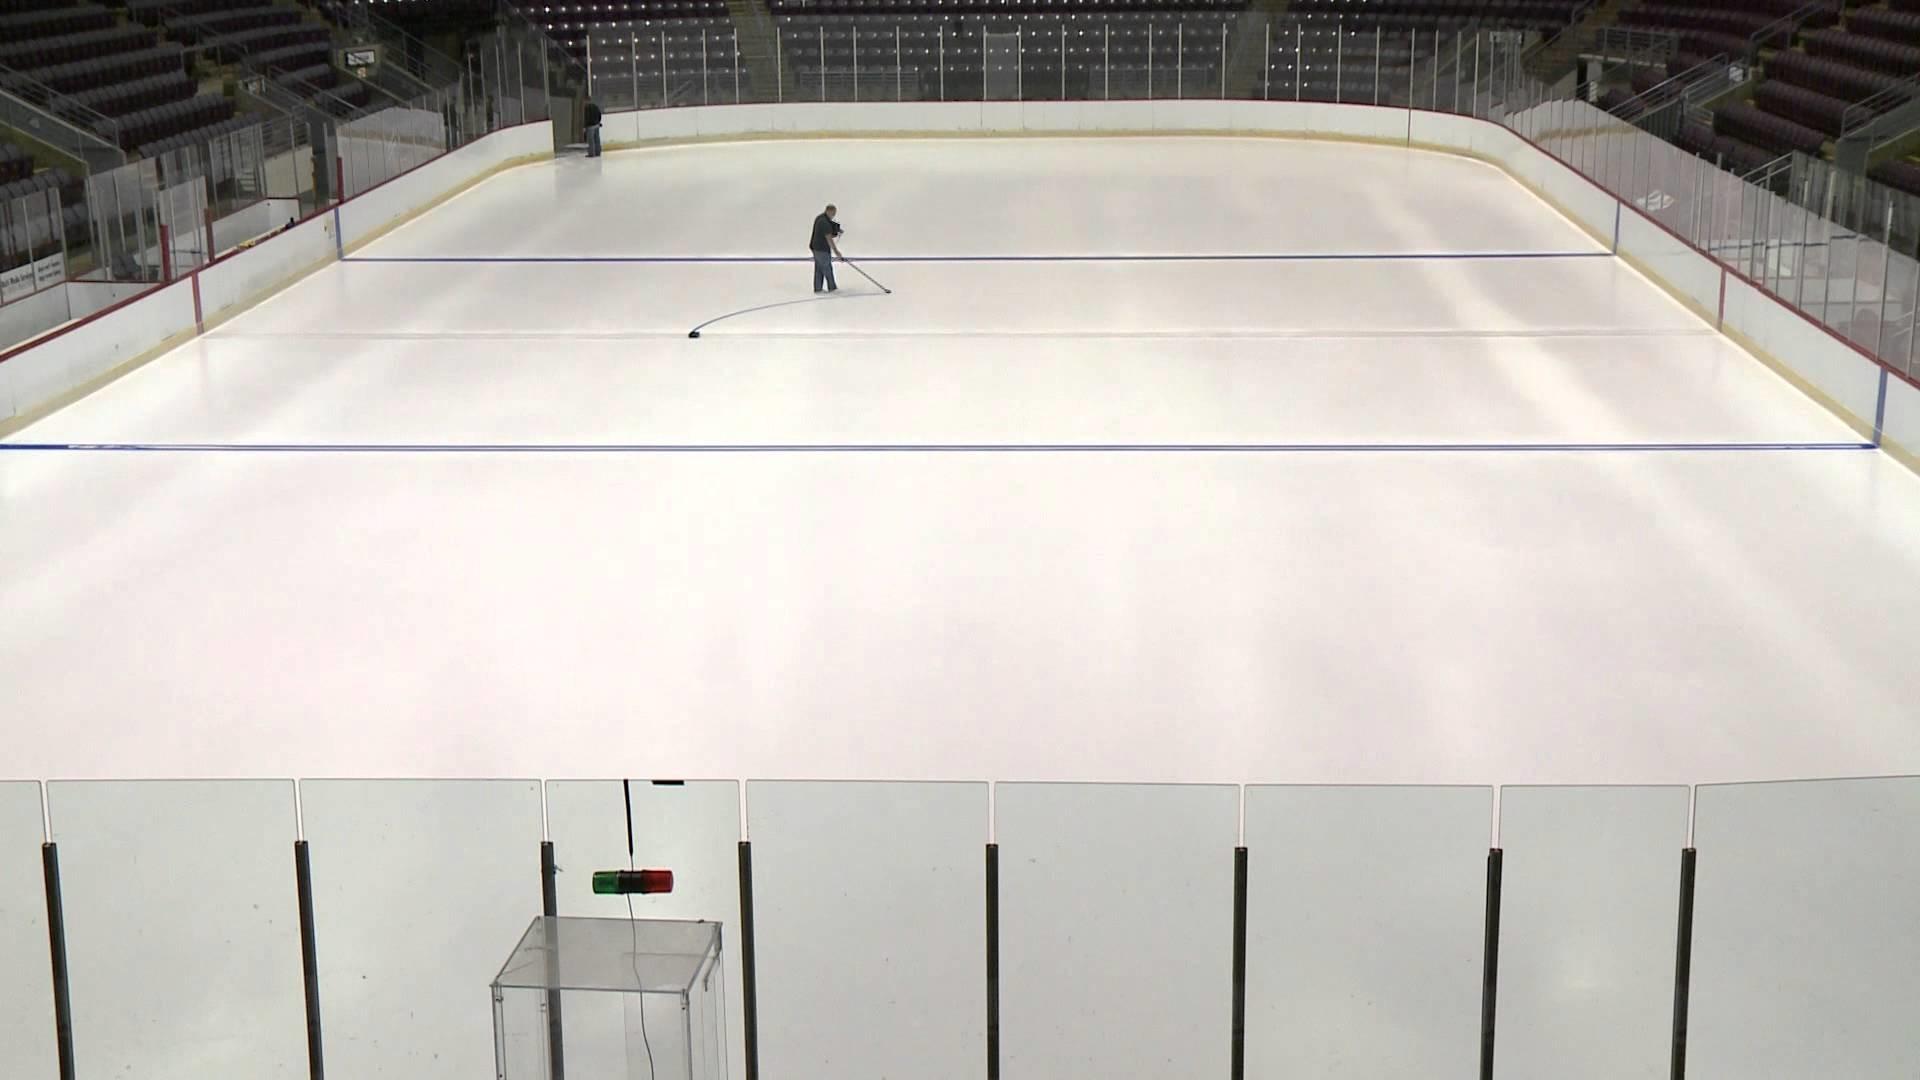 Jackals Hockey Rink Time Lapse